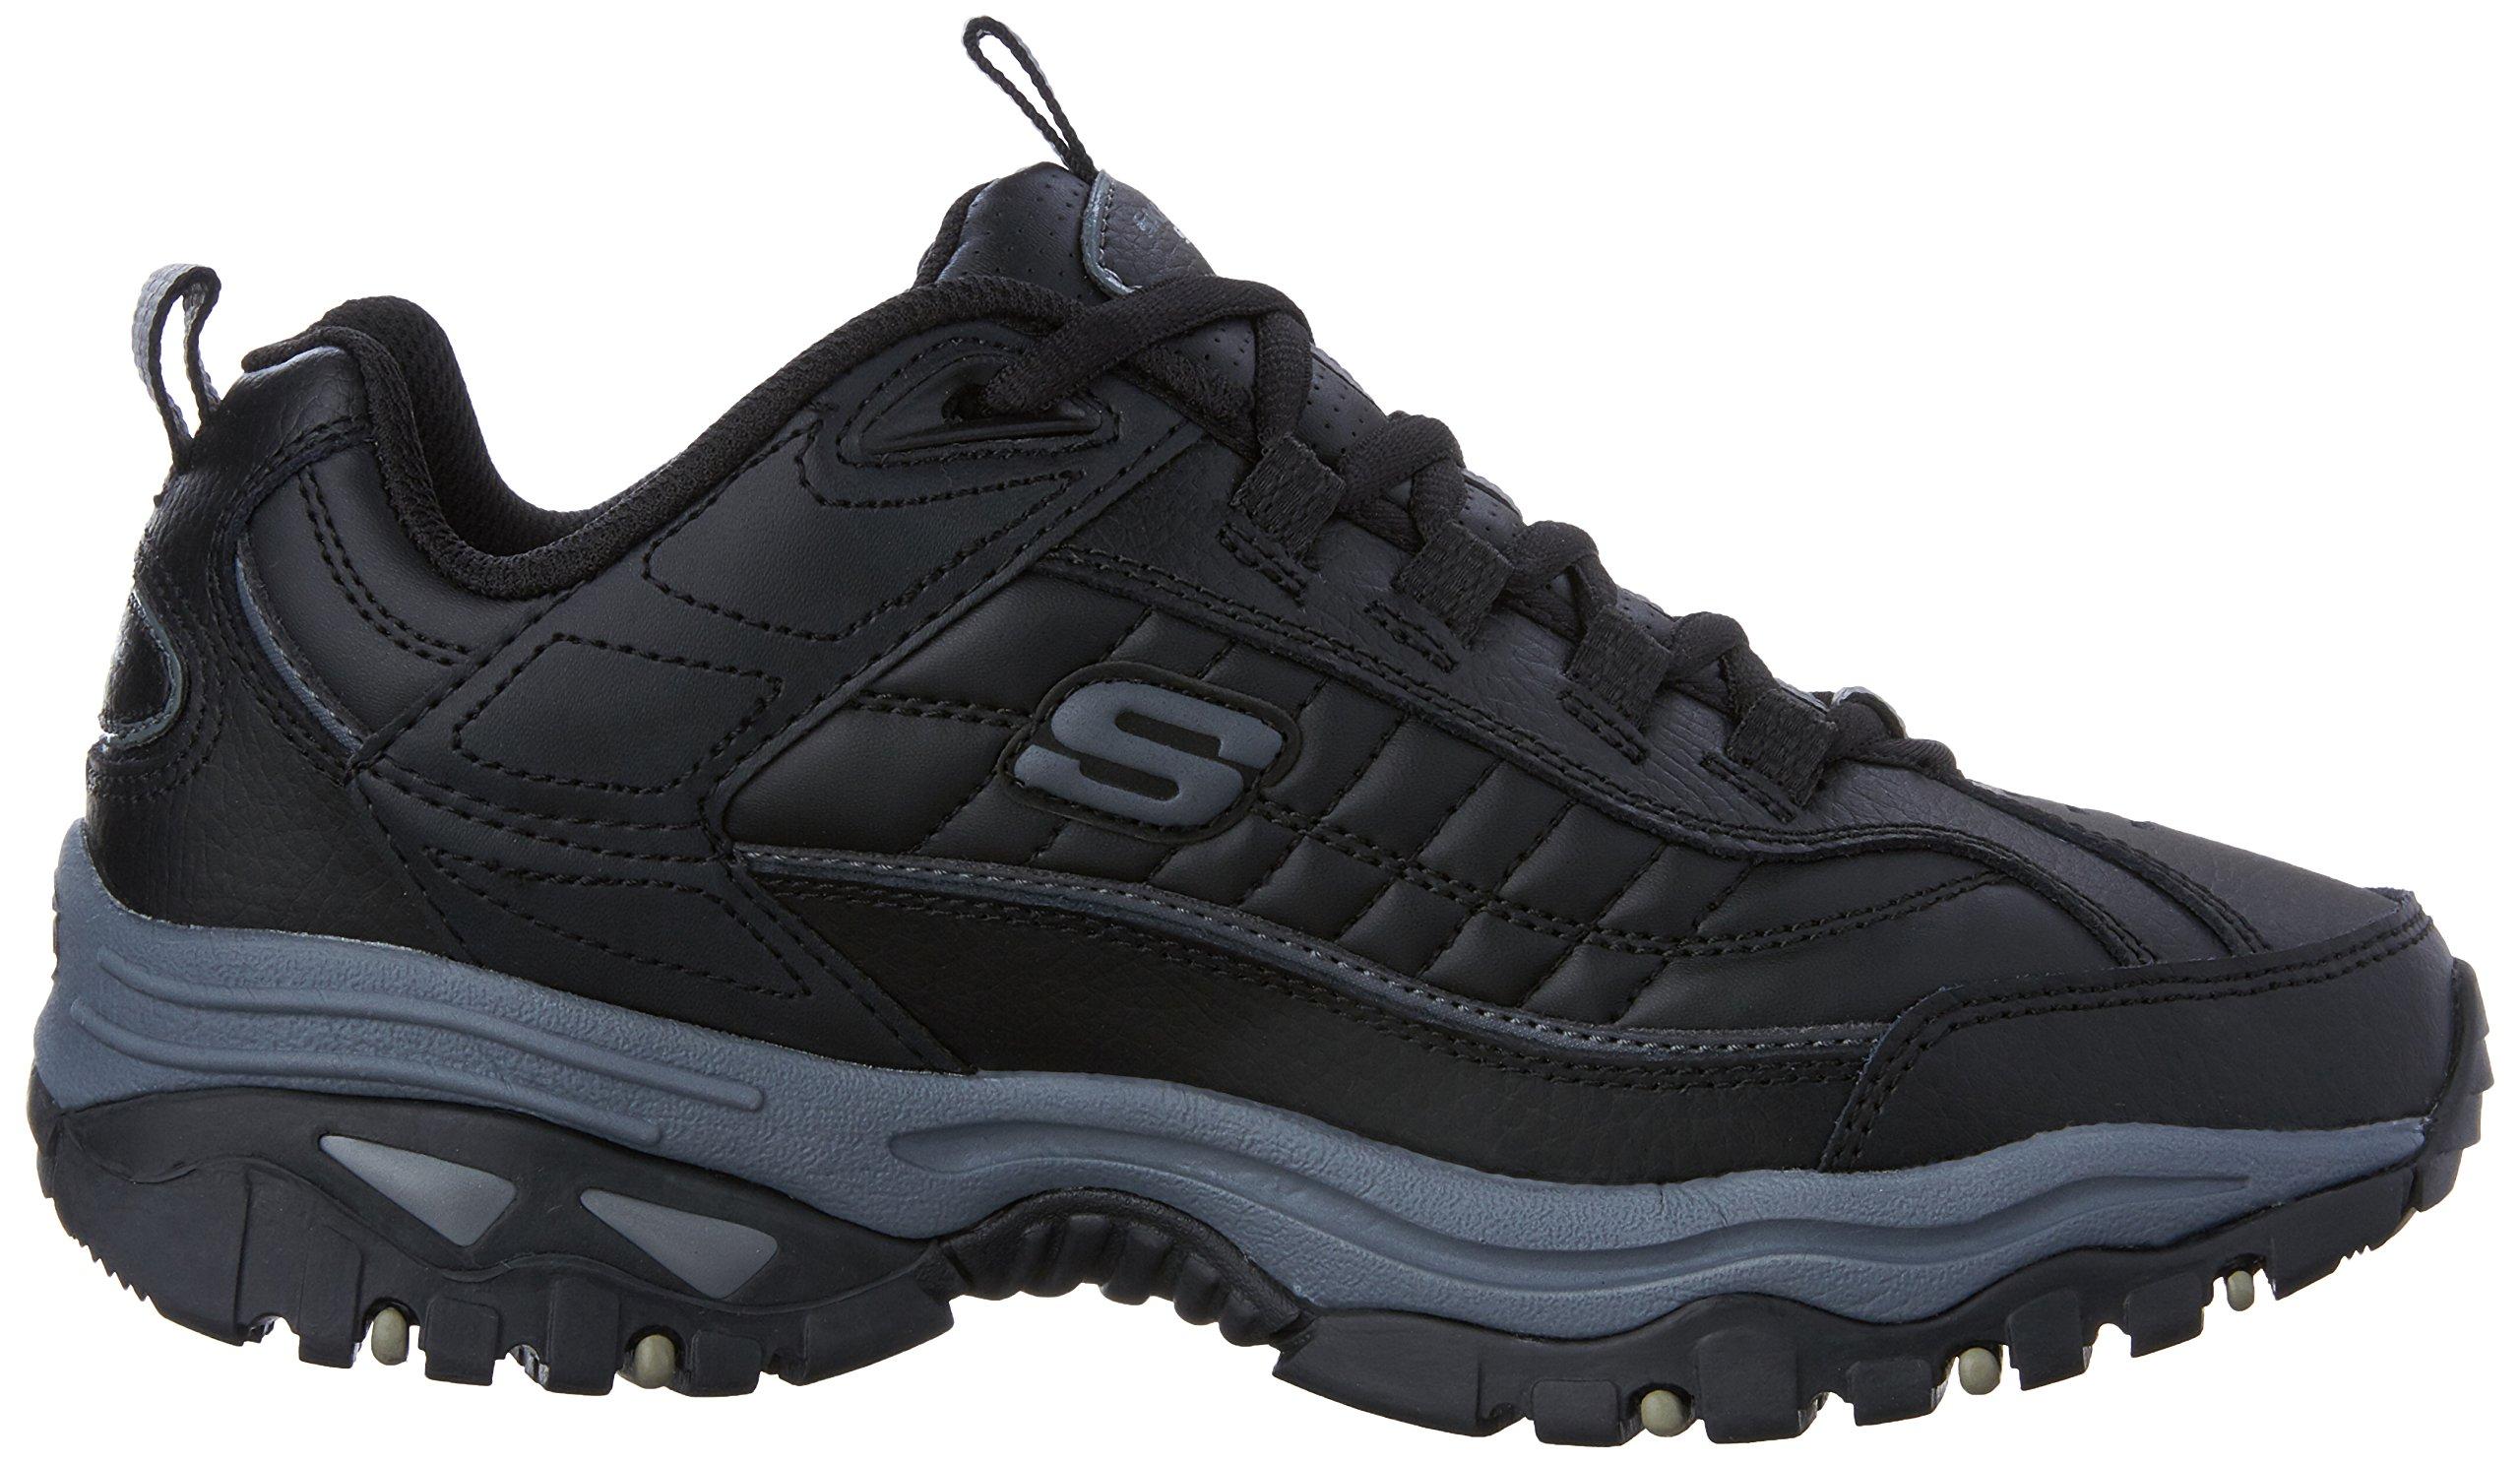 Skechers Men's Energy Afterburn Lace-Up Sneaker,Black/Gray,14 M US by Skechers (Image #7)